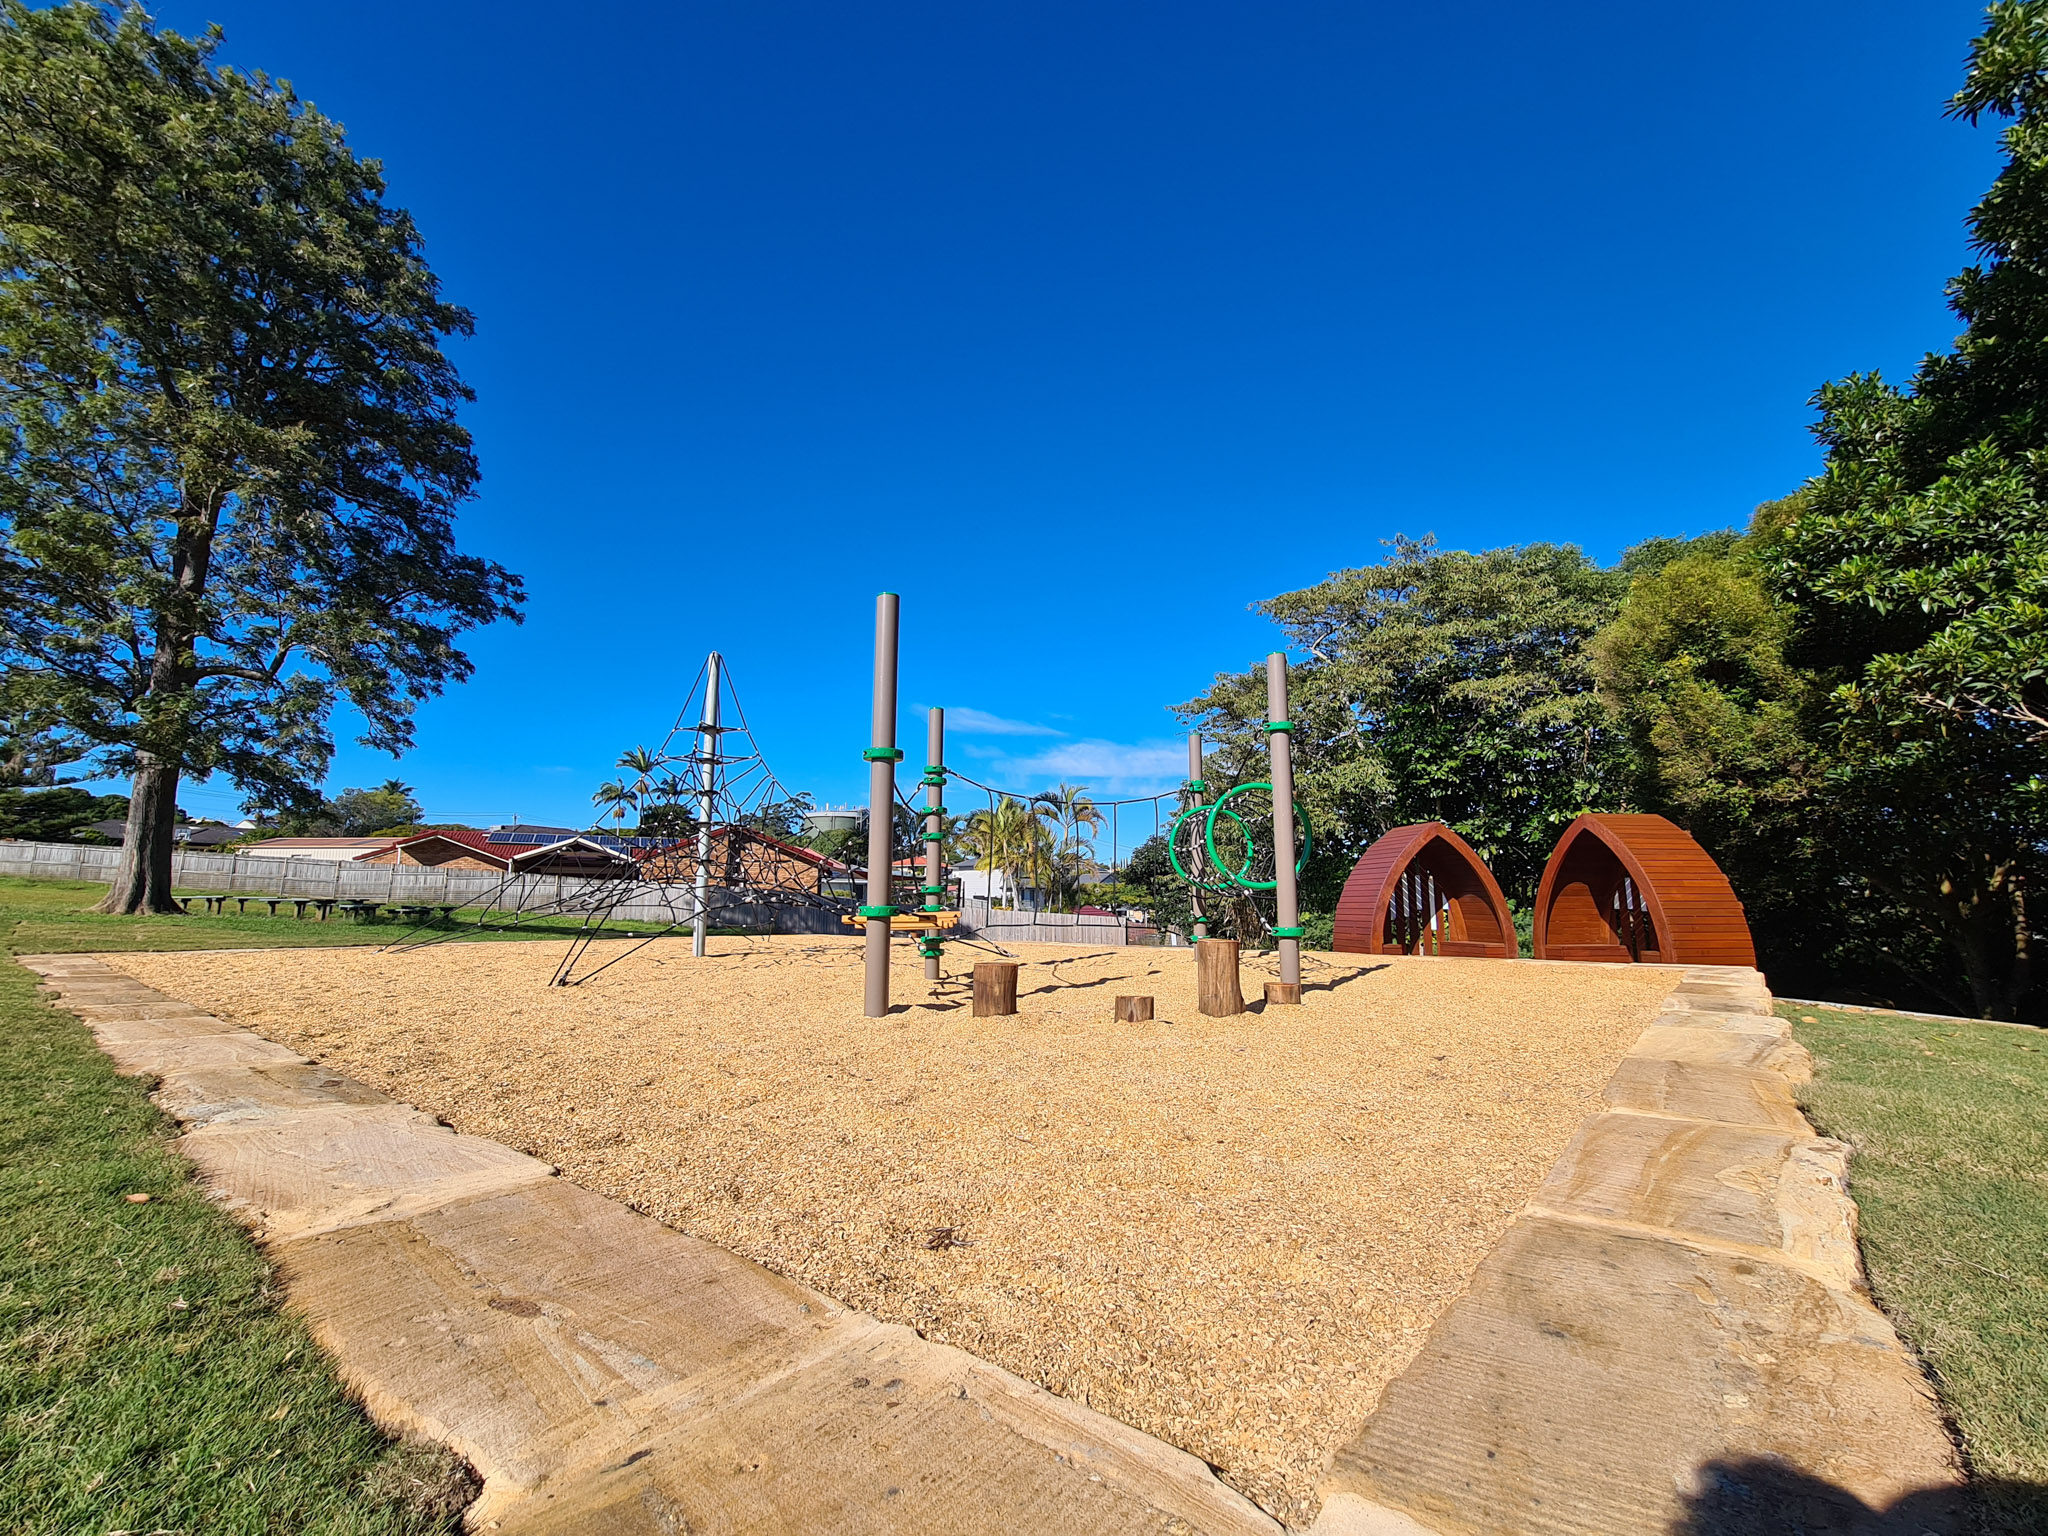 palm-beach-state-school-playrground-austek-play-22